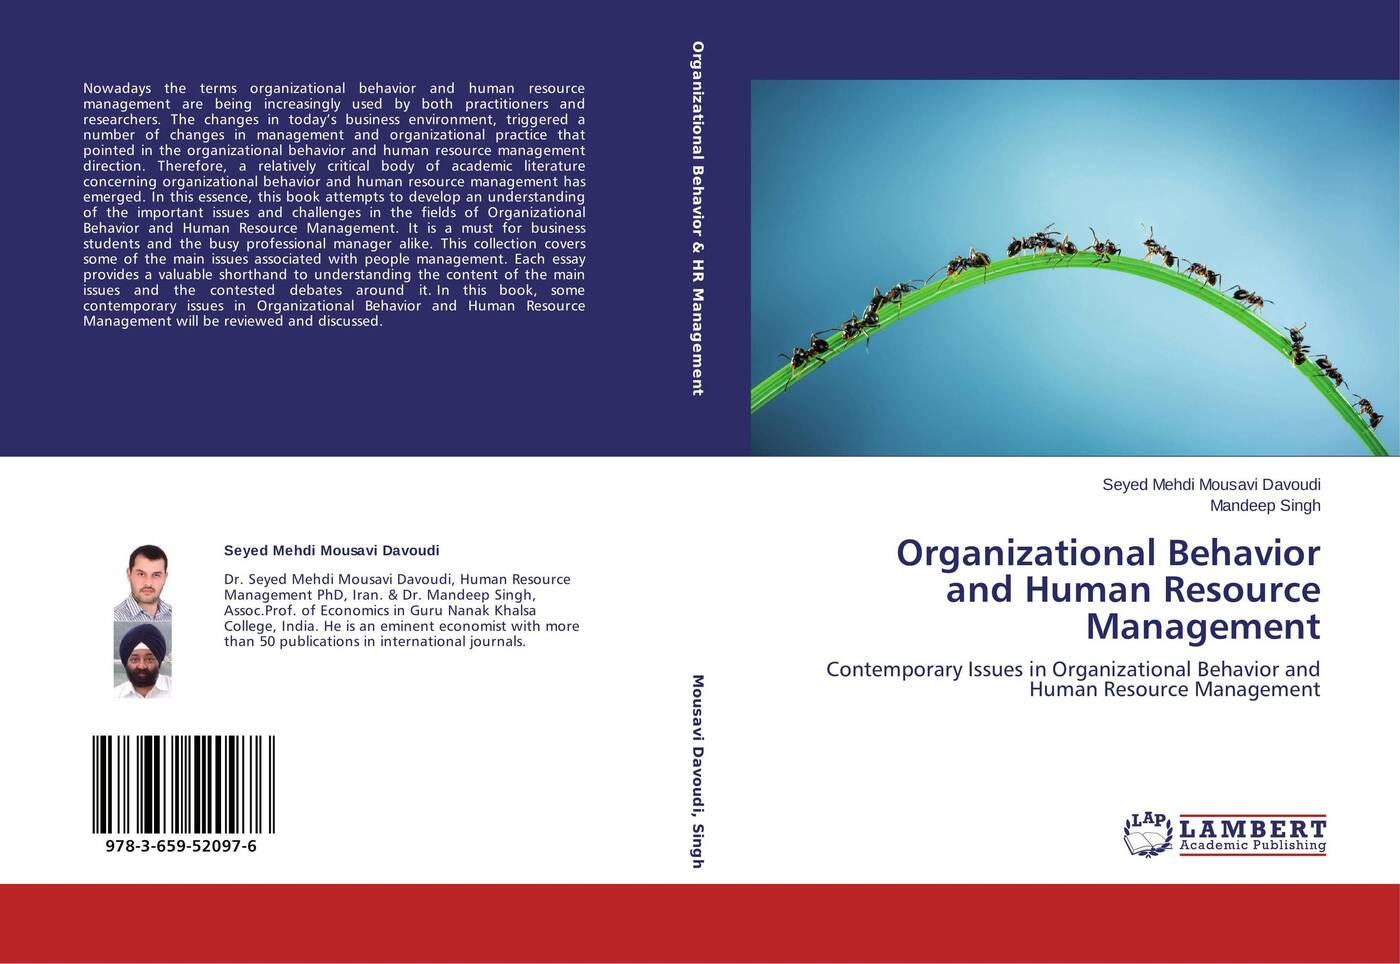 Seyed Mehdi Mousavi Davoudi and Mandeep Singh Organizational Behavior Human Resource Management